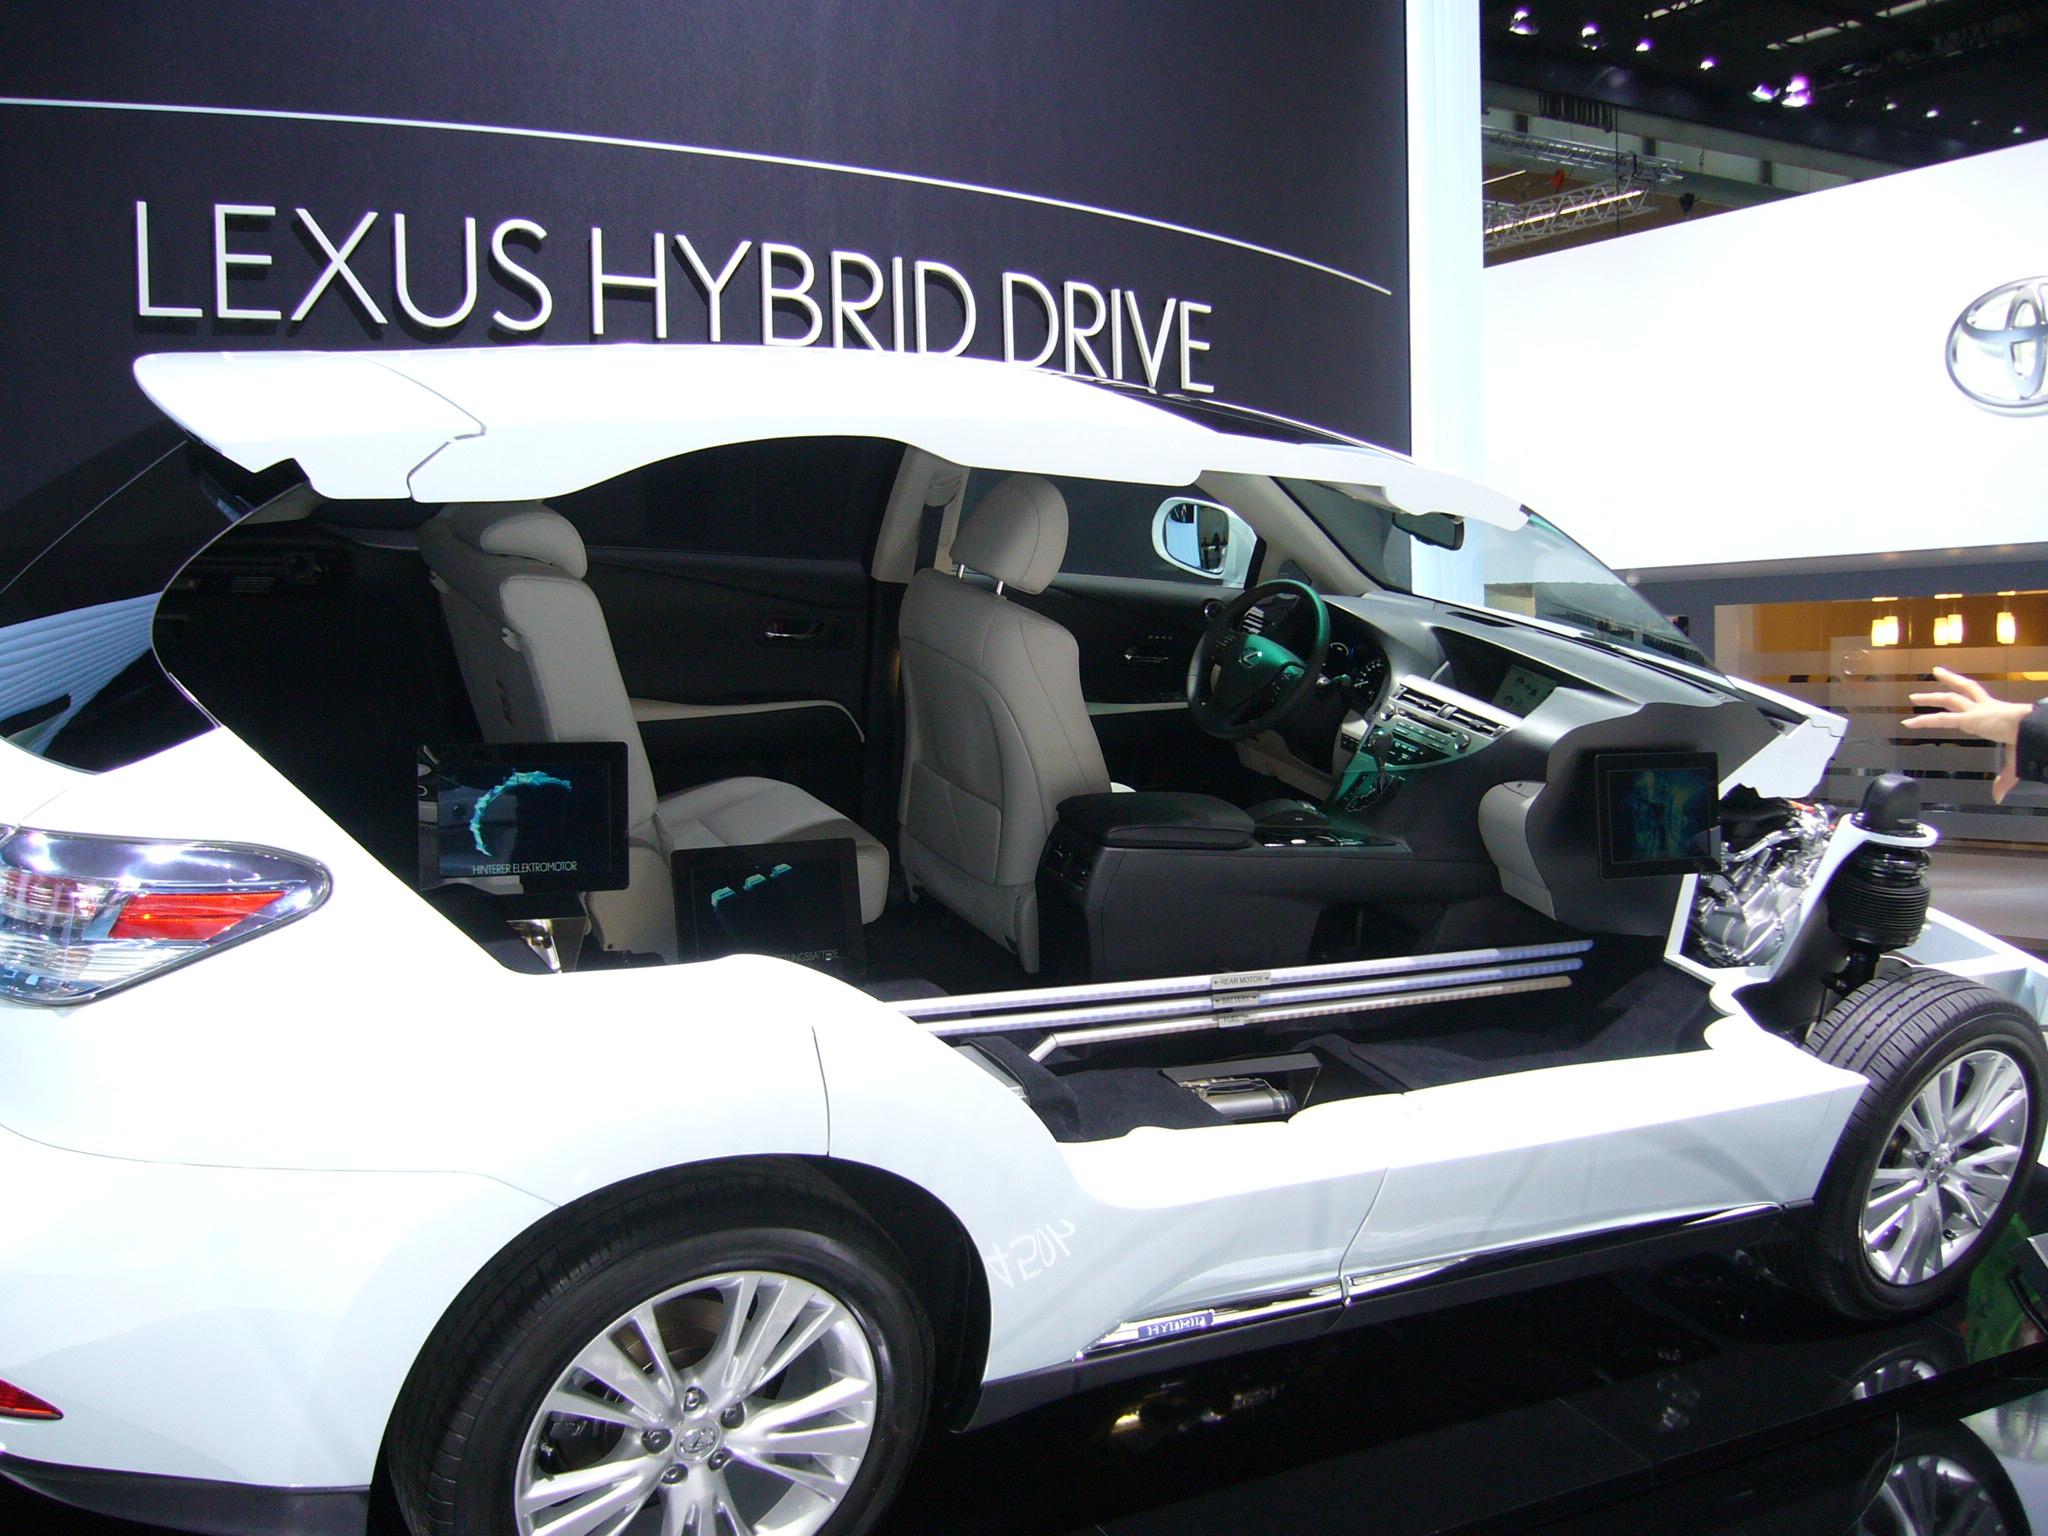 Lexus Hybrid Drive; The best hybrid power train